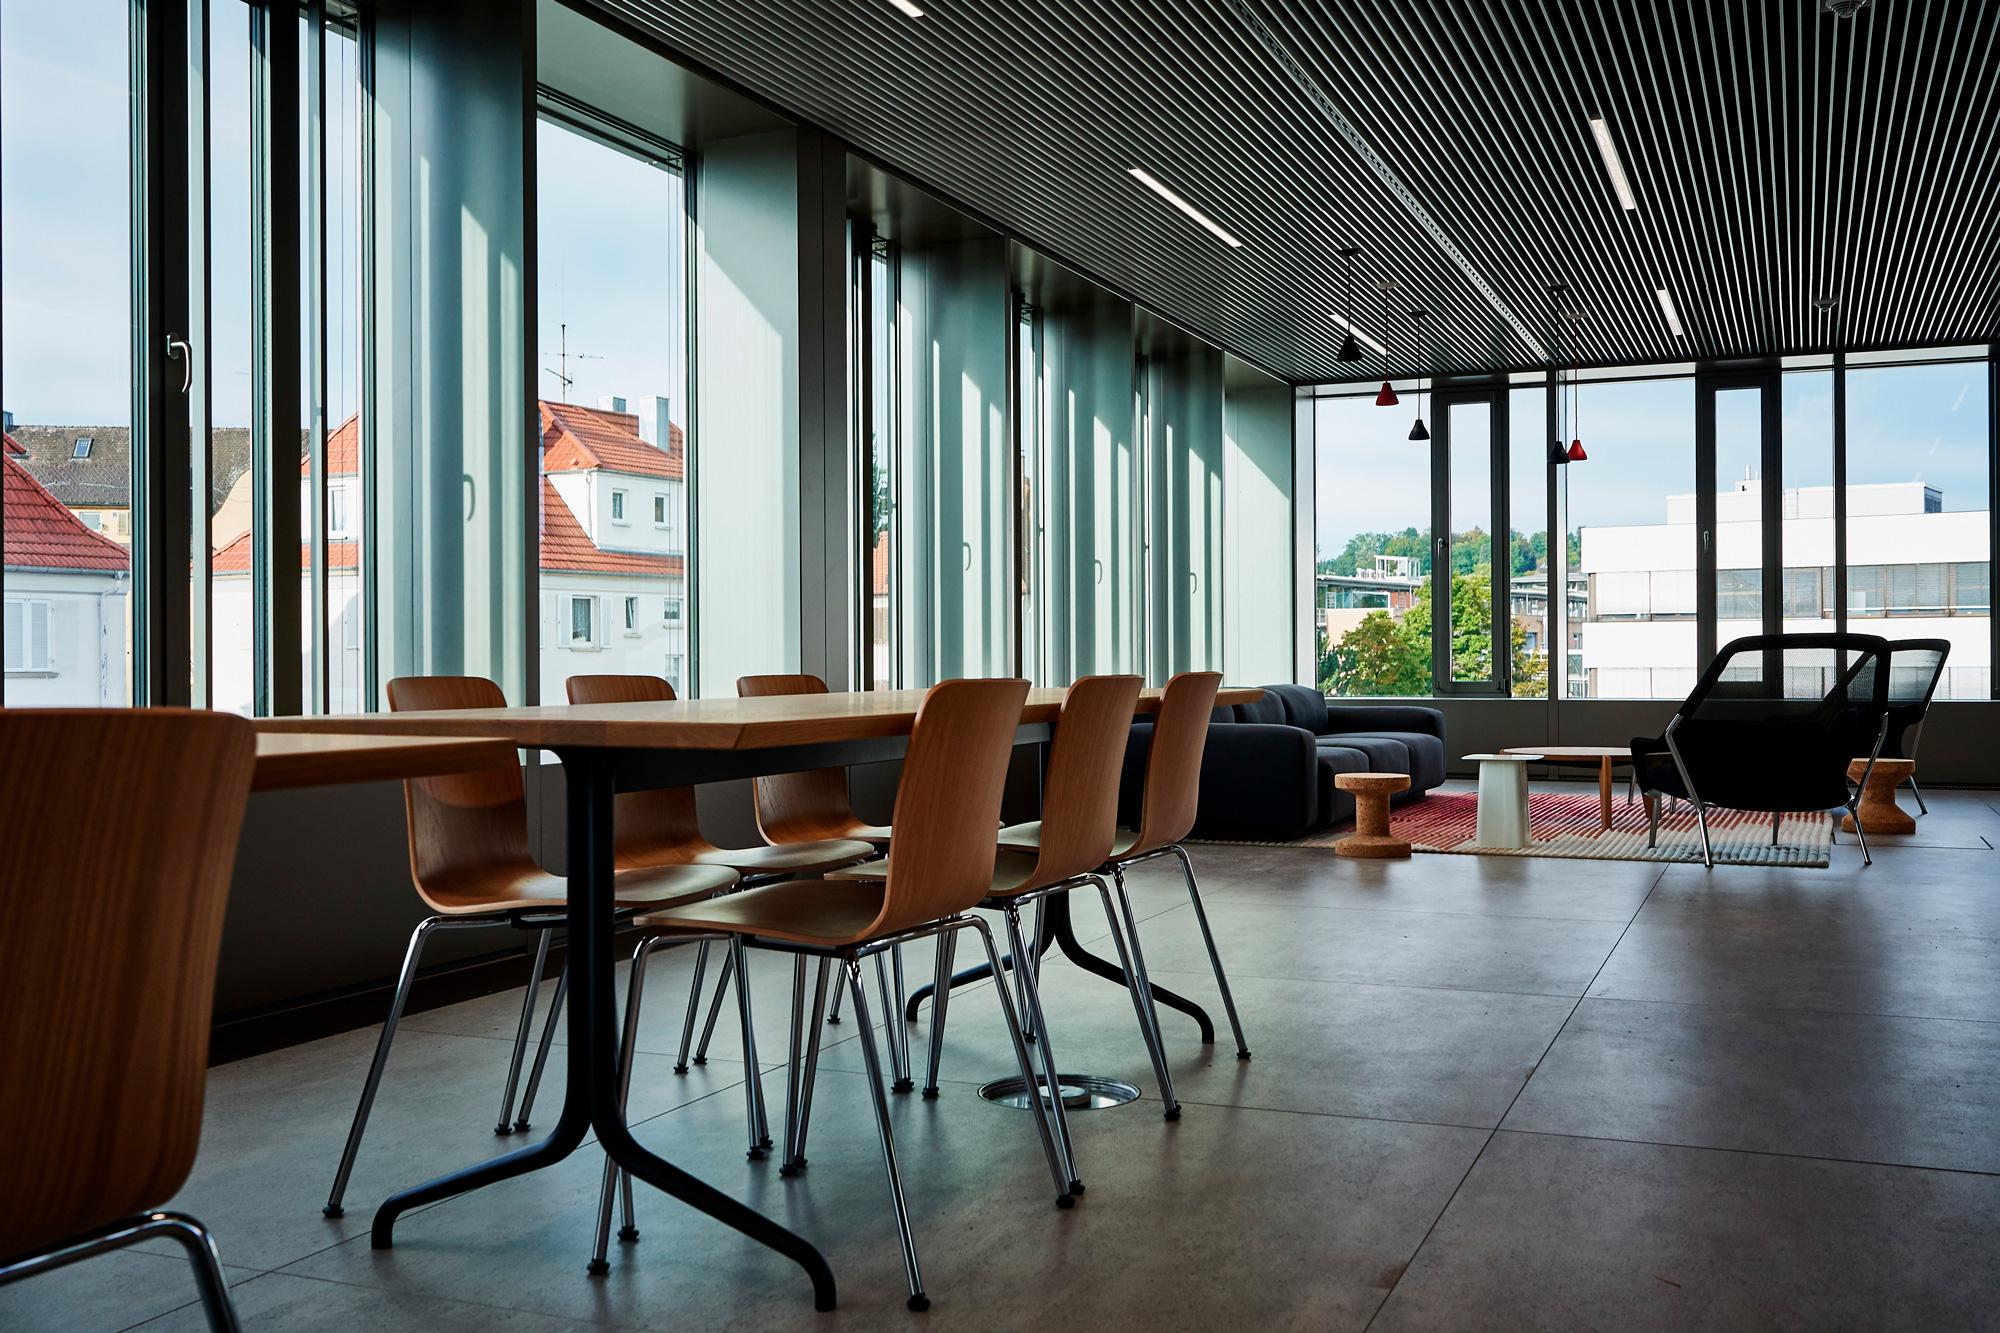 Kreissparkasse  - KSK Rottweil Casino2 56